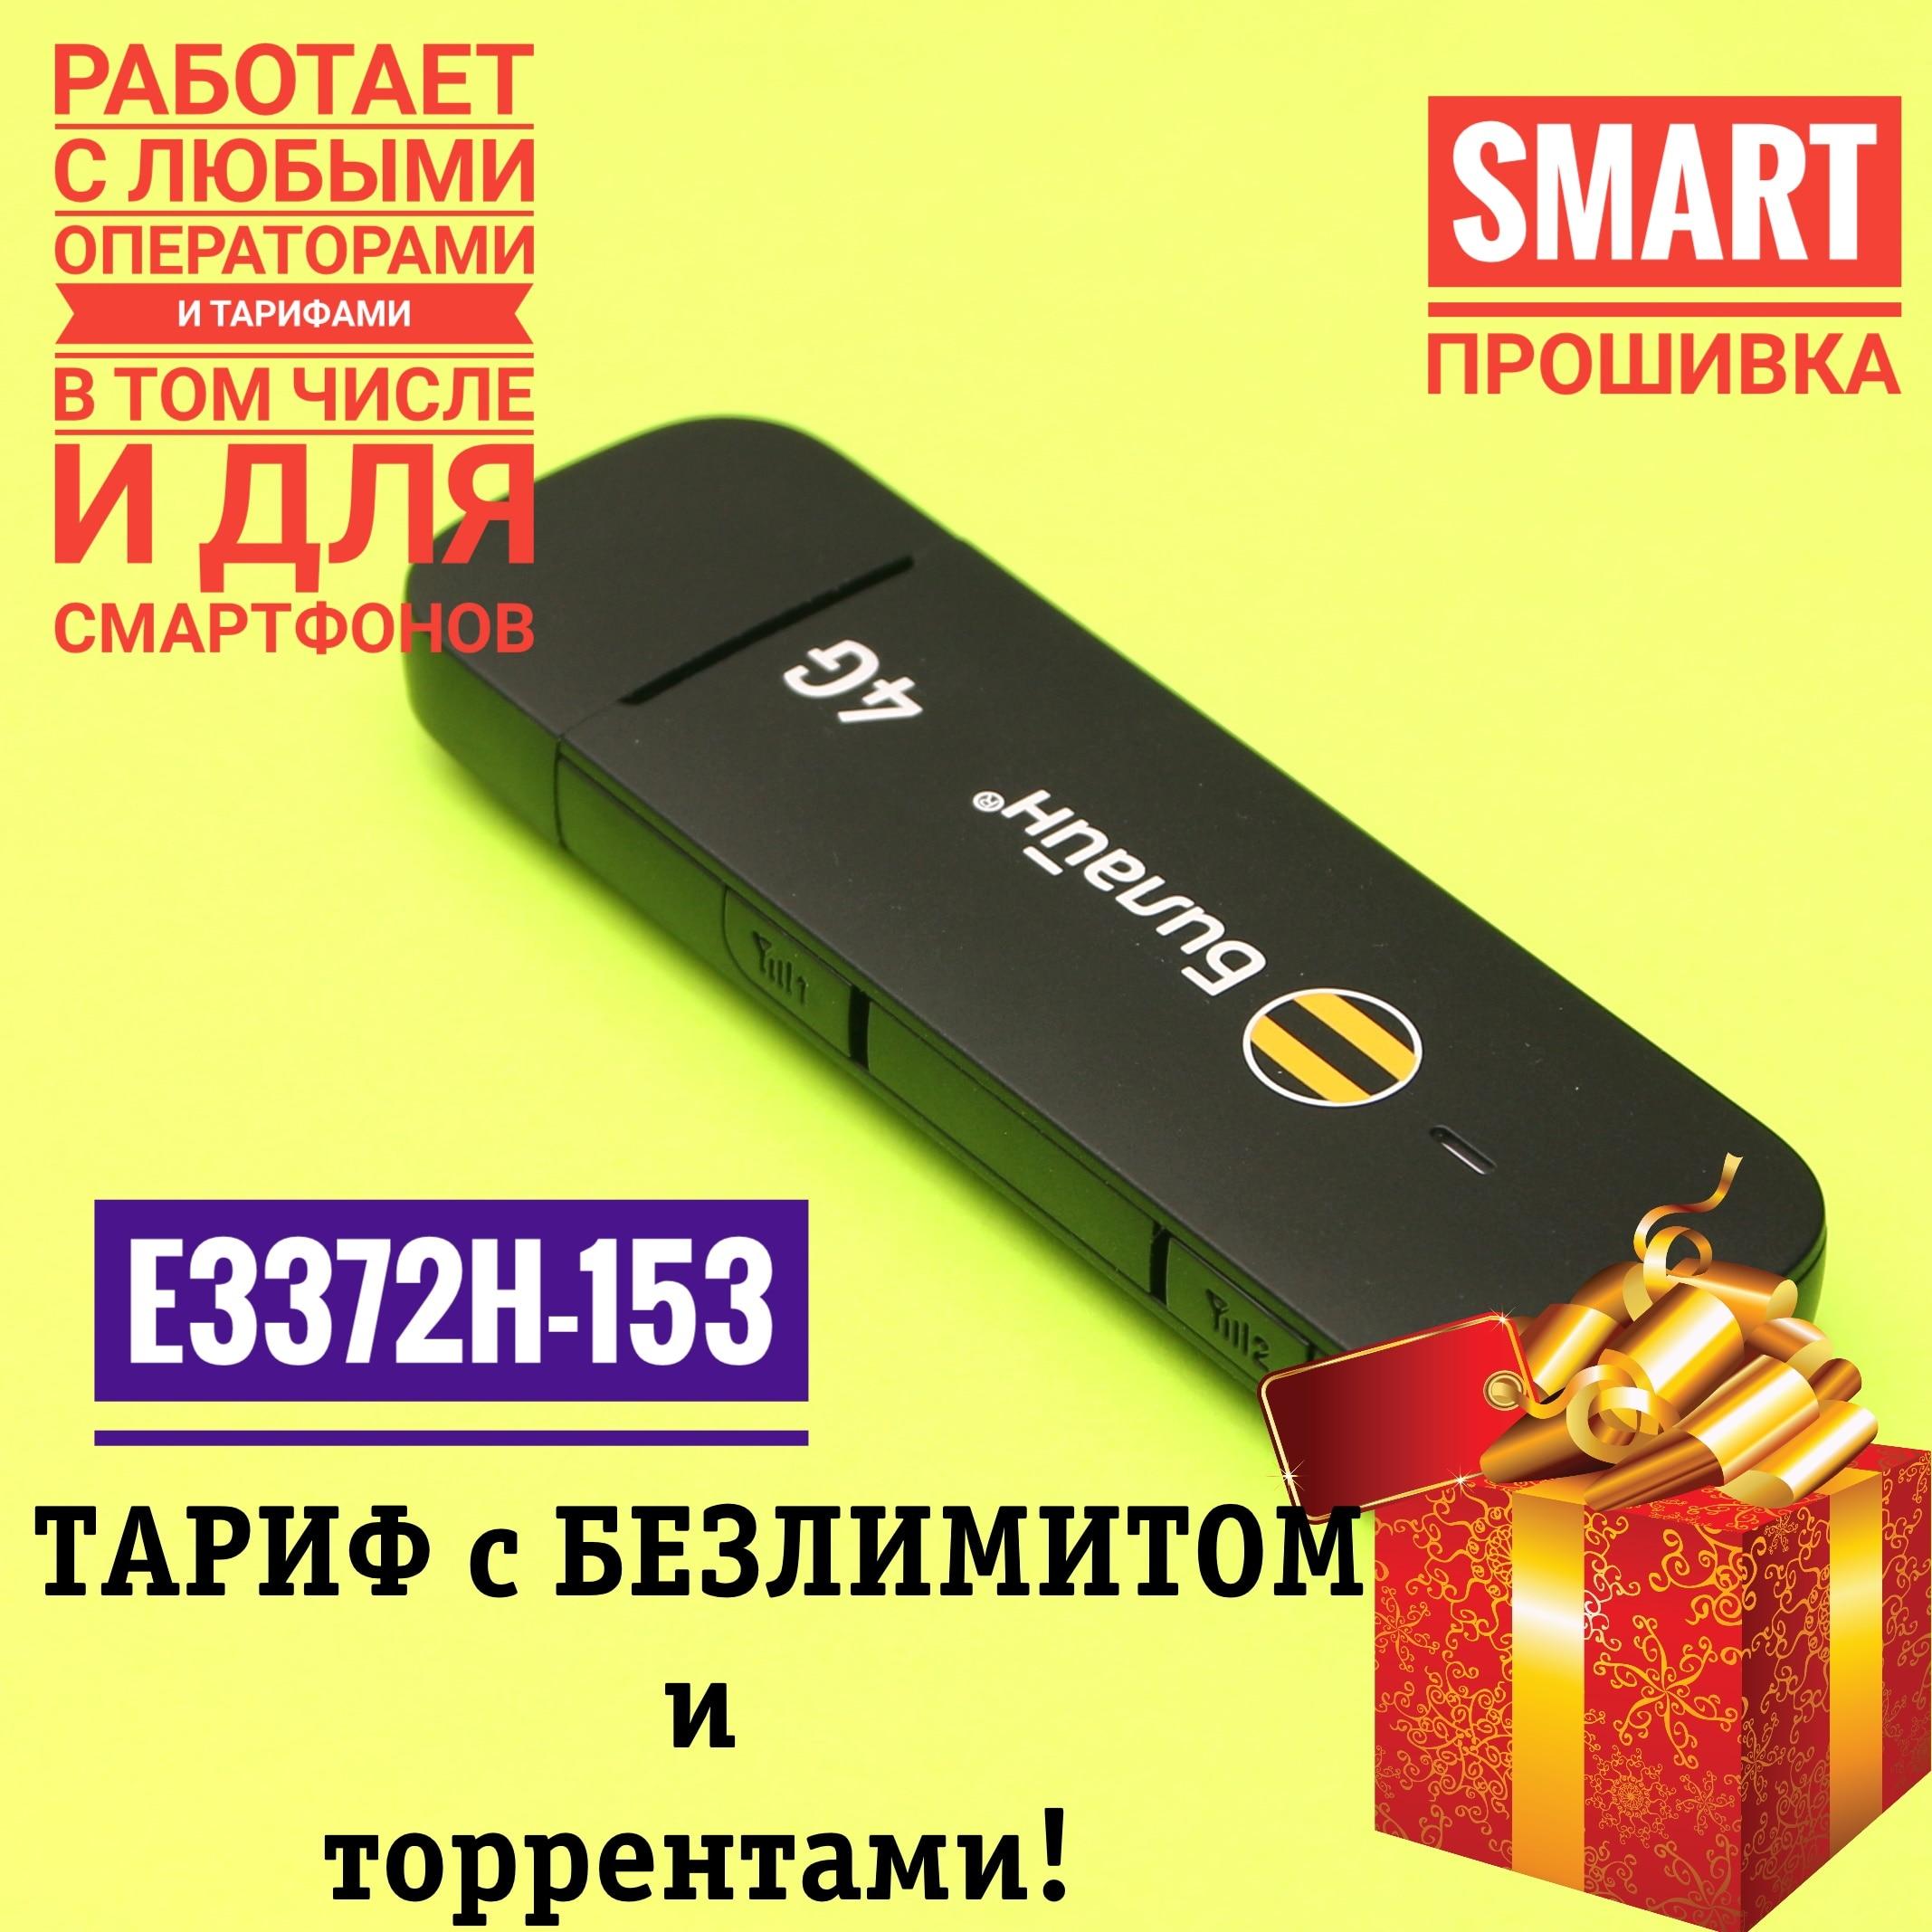 Модем c полным БЕЗЛИМИТОМ за 350 в мес. Билайн E3370 (Он же Huawei E3372h-153 E3372) USB LTE 4G 3G 2G HiLink разблокированный c